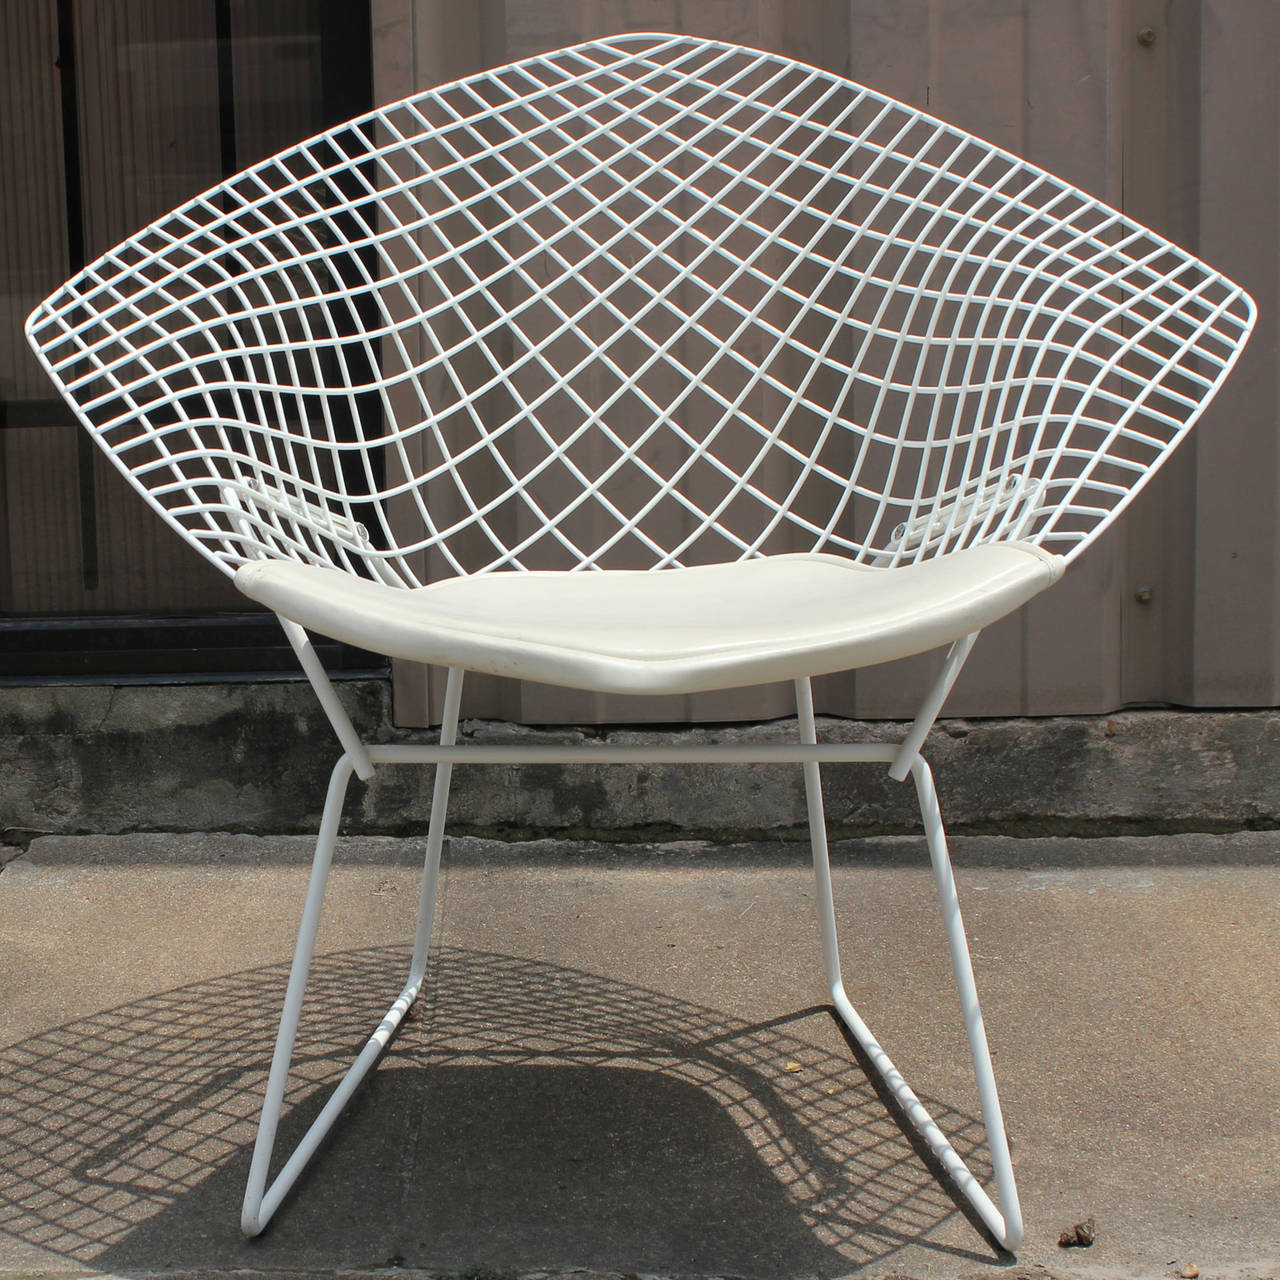 Bertoia diamond chair white - White Diamond Chair By Harry Bertoia For Knoll 2